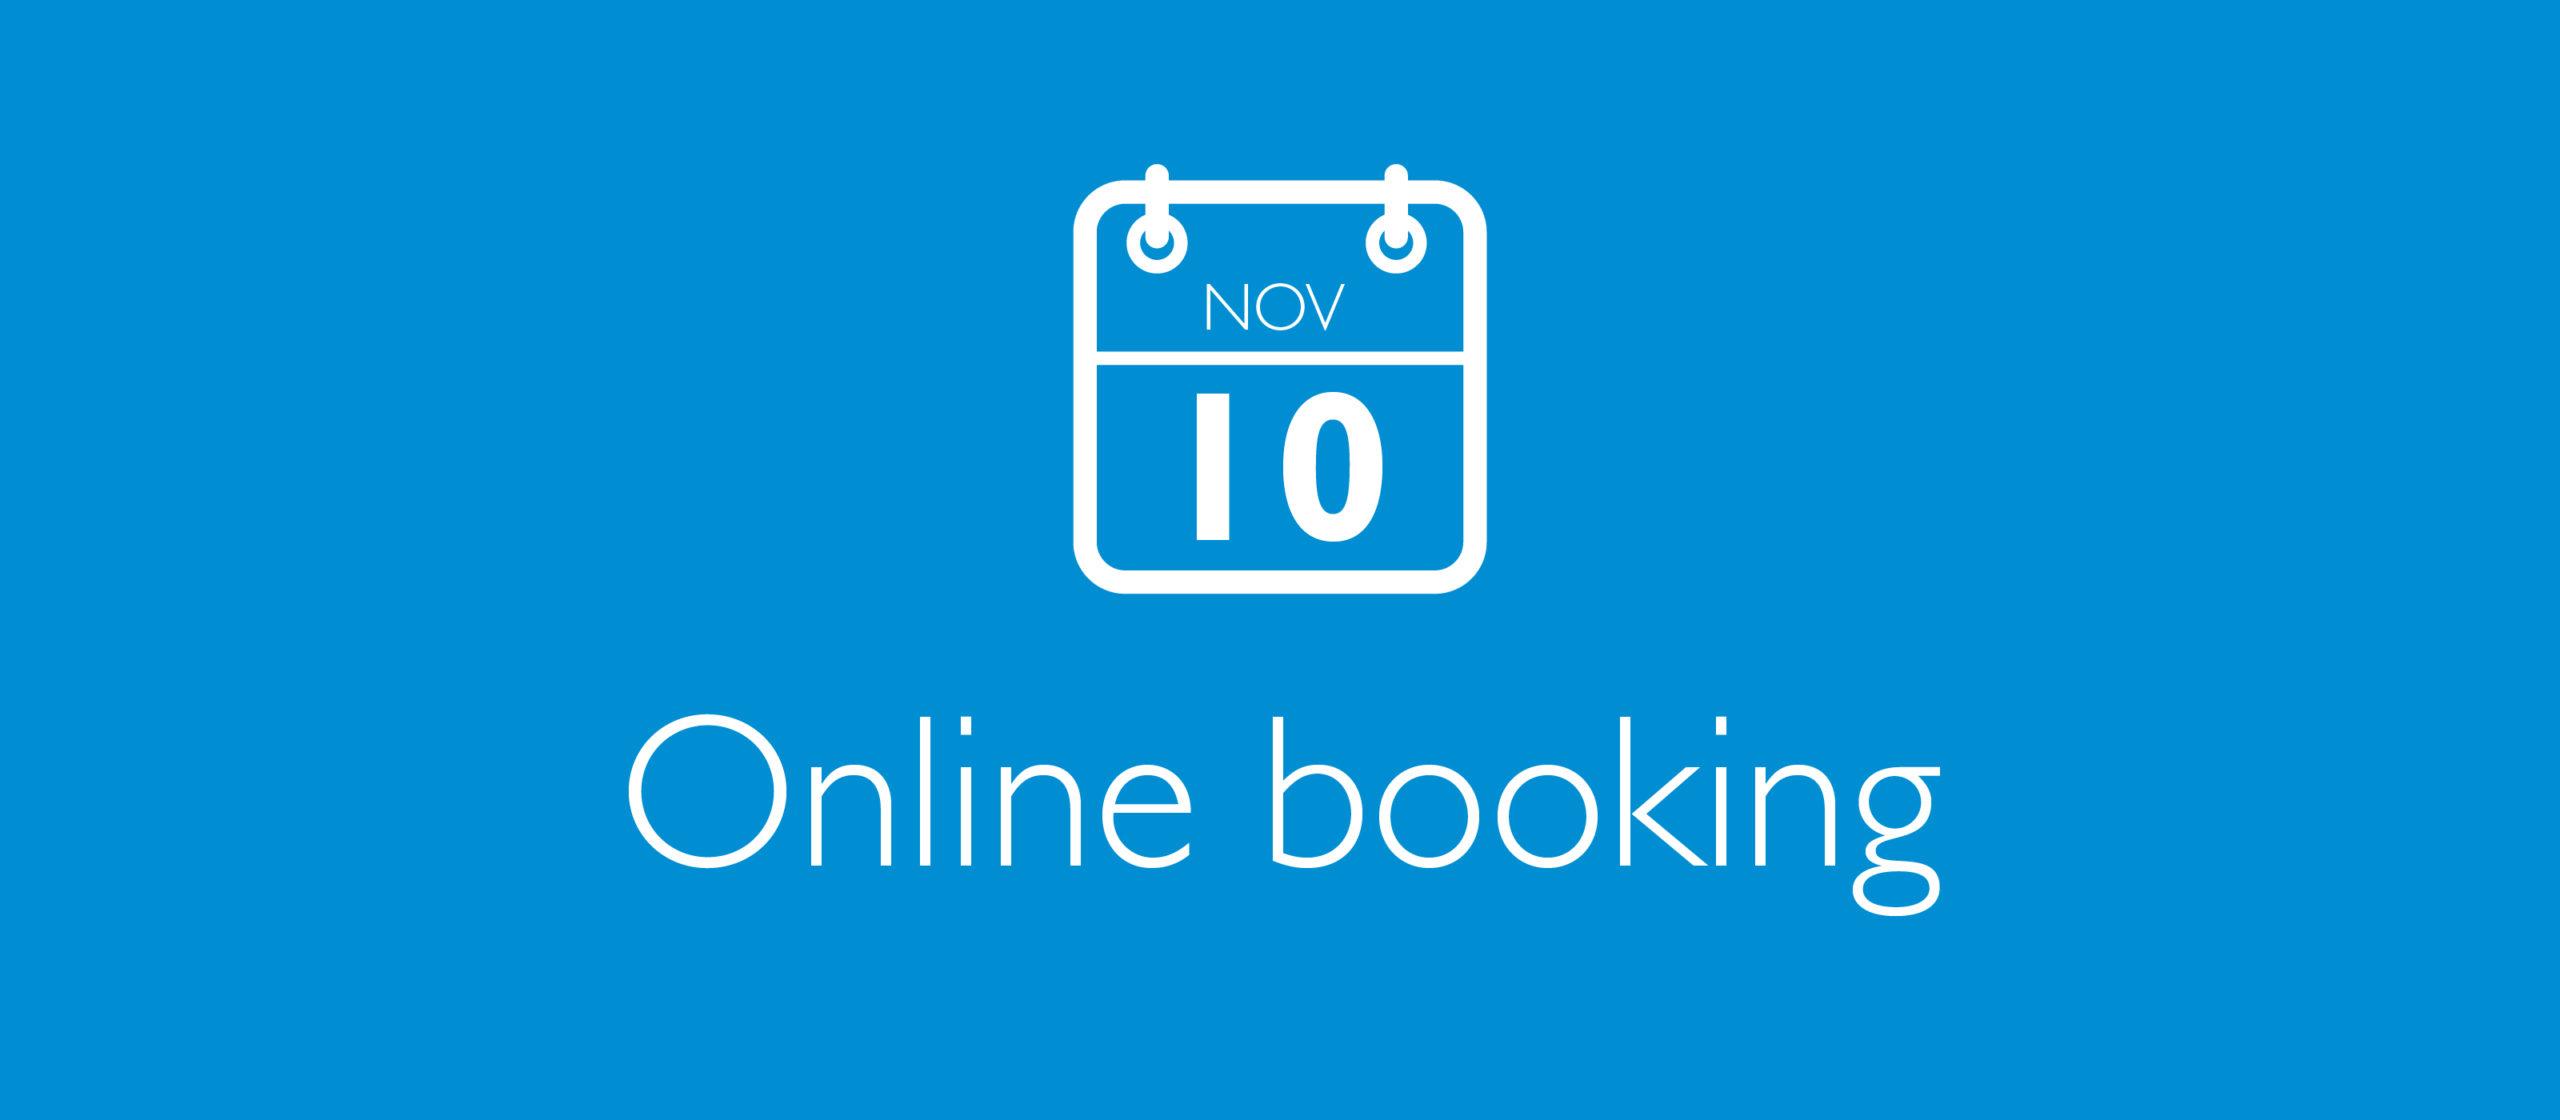 Bookings via Eventbrite